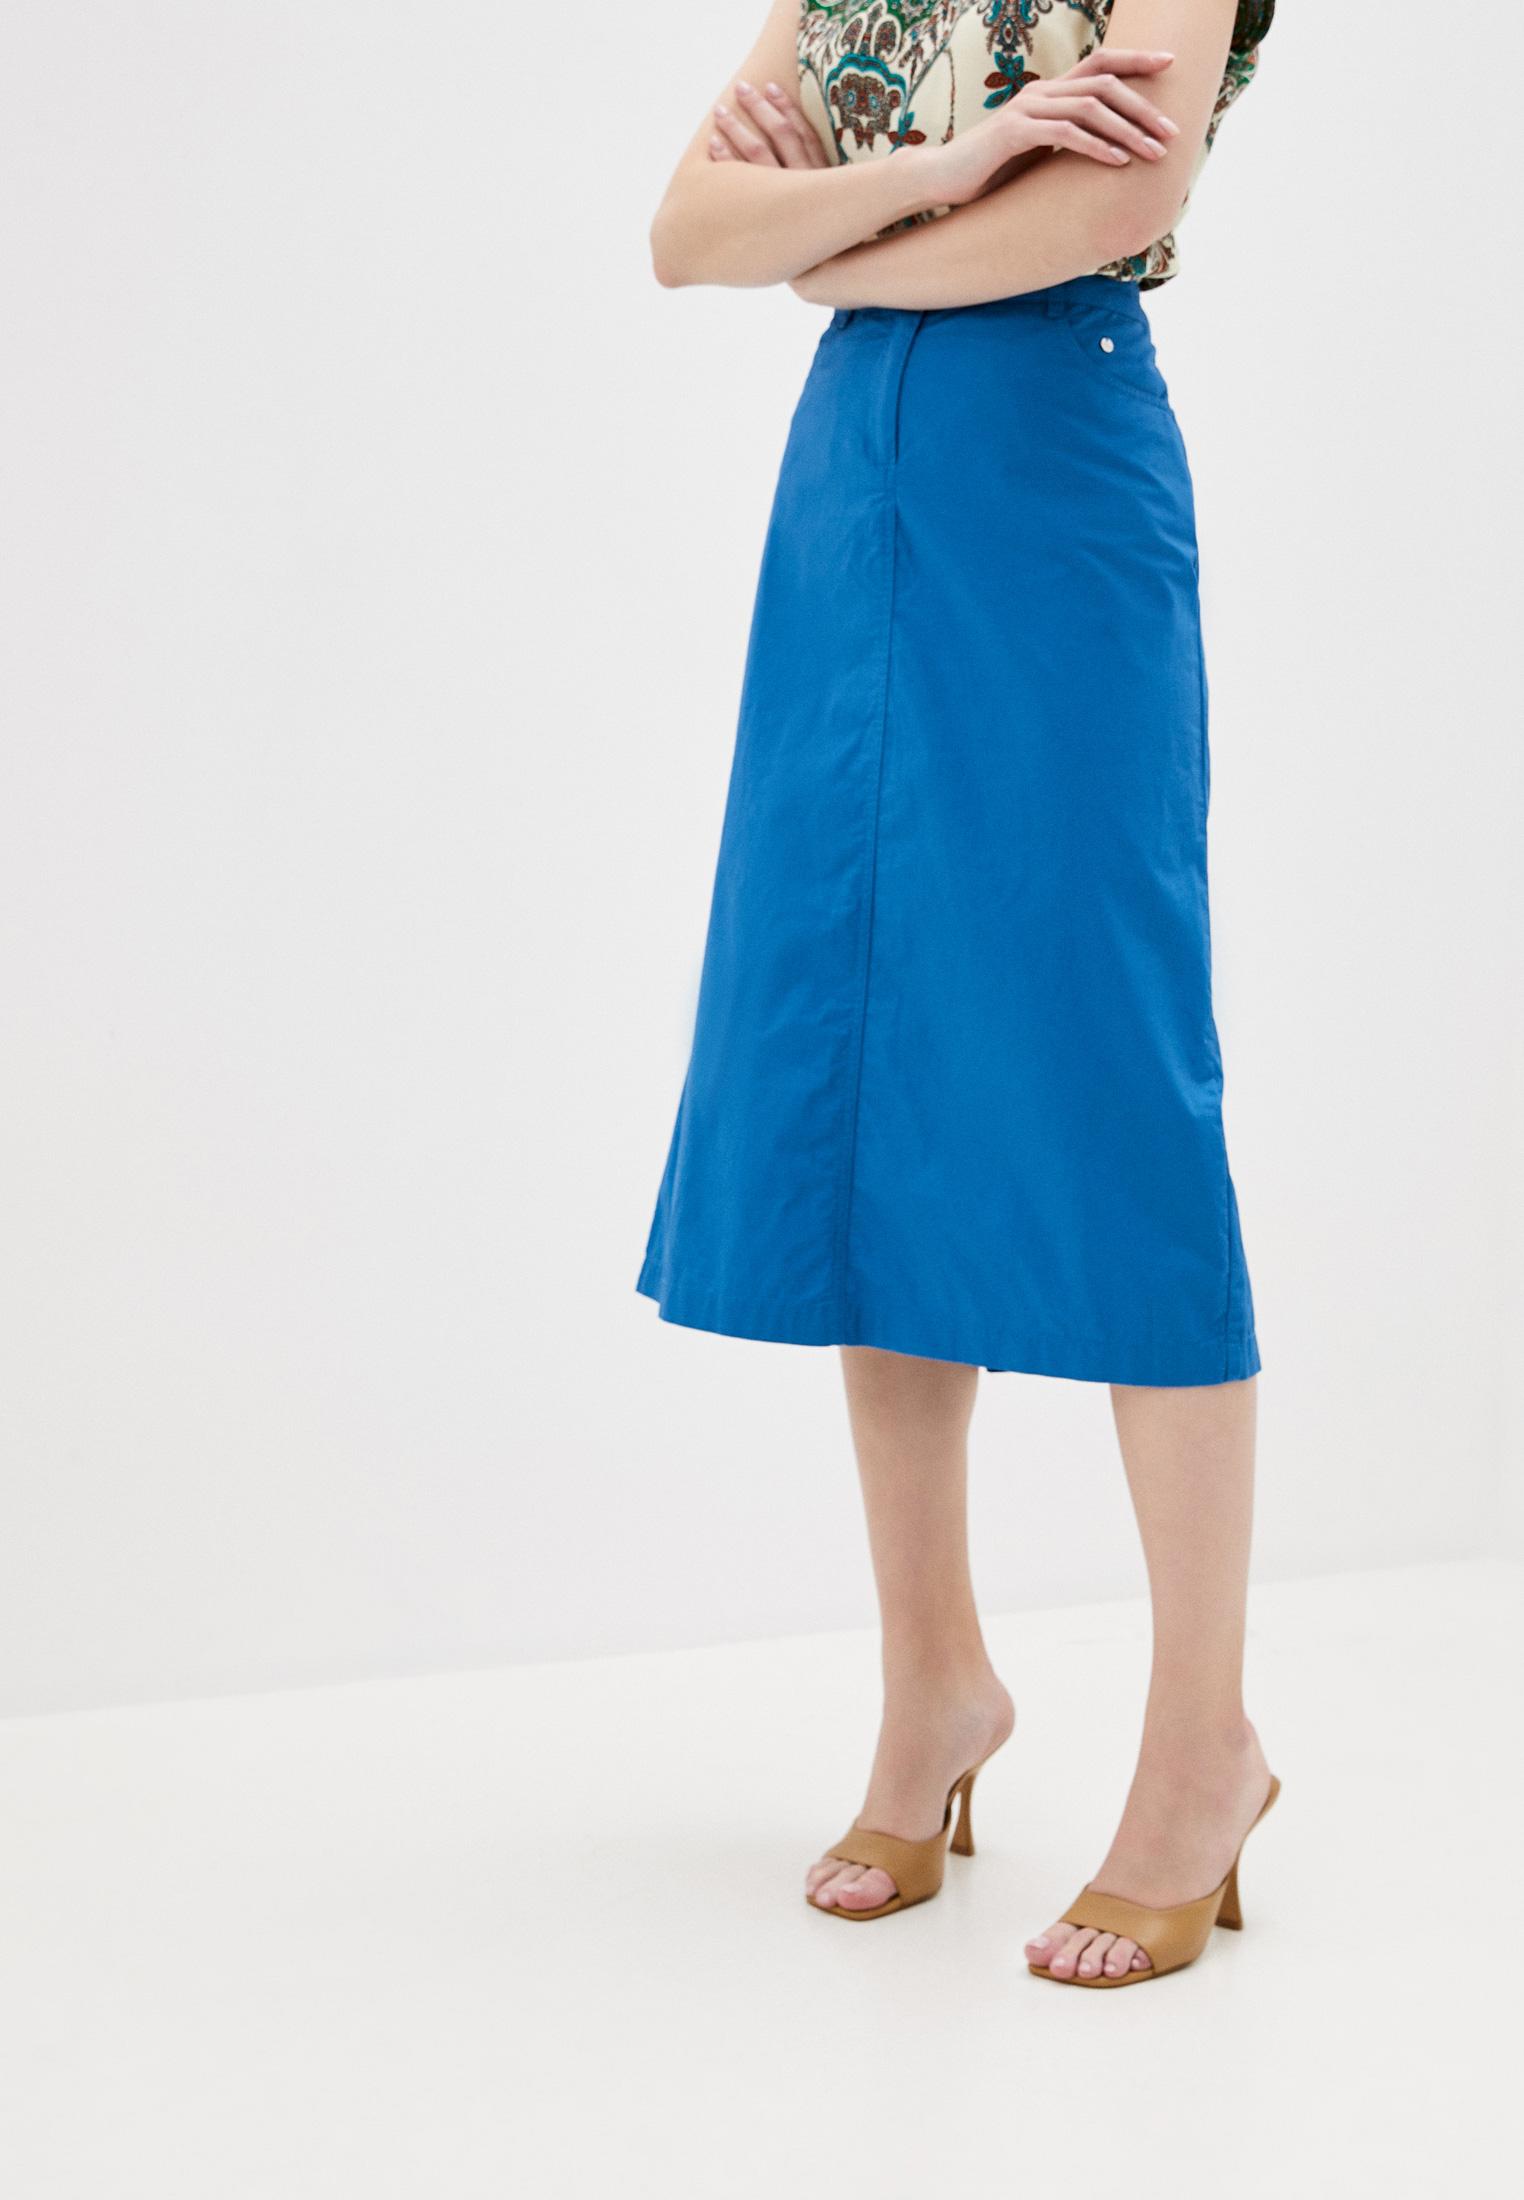 Широкая юбка Finn Flare (Фин Флаер) S18-32036